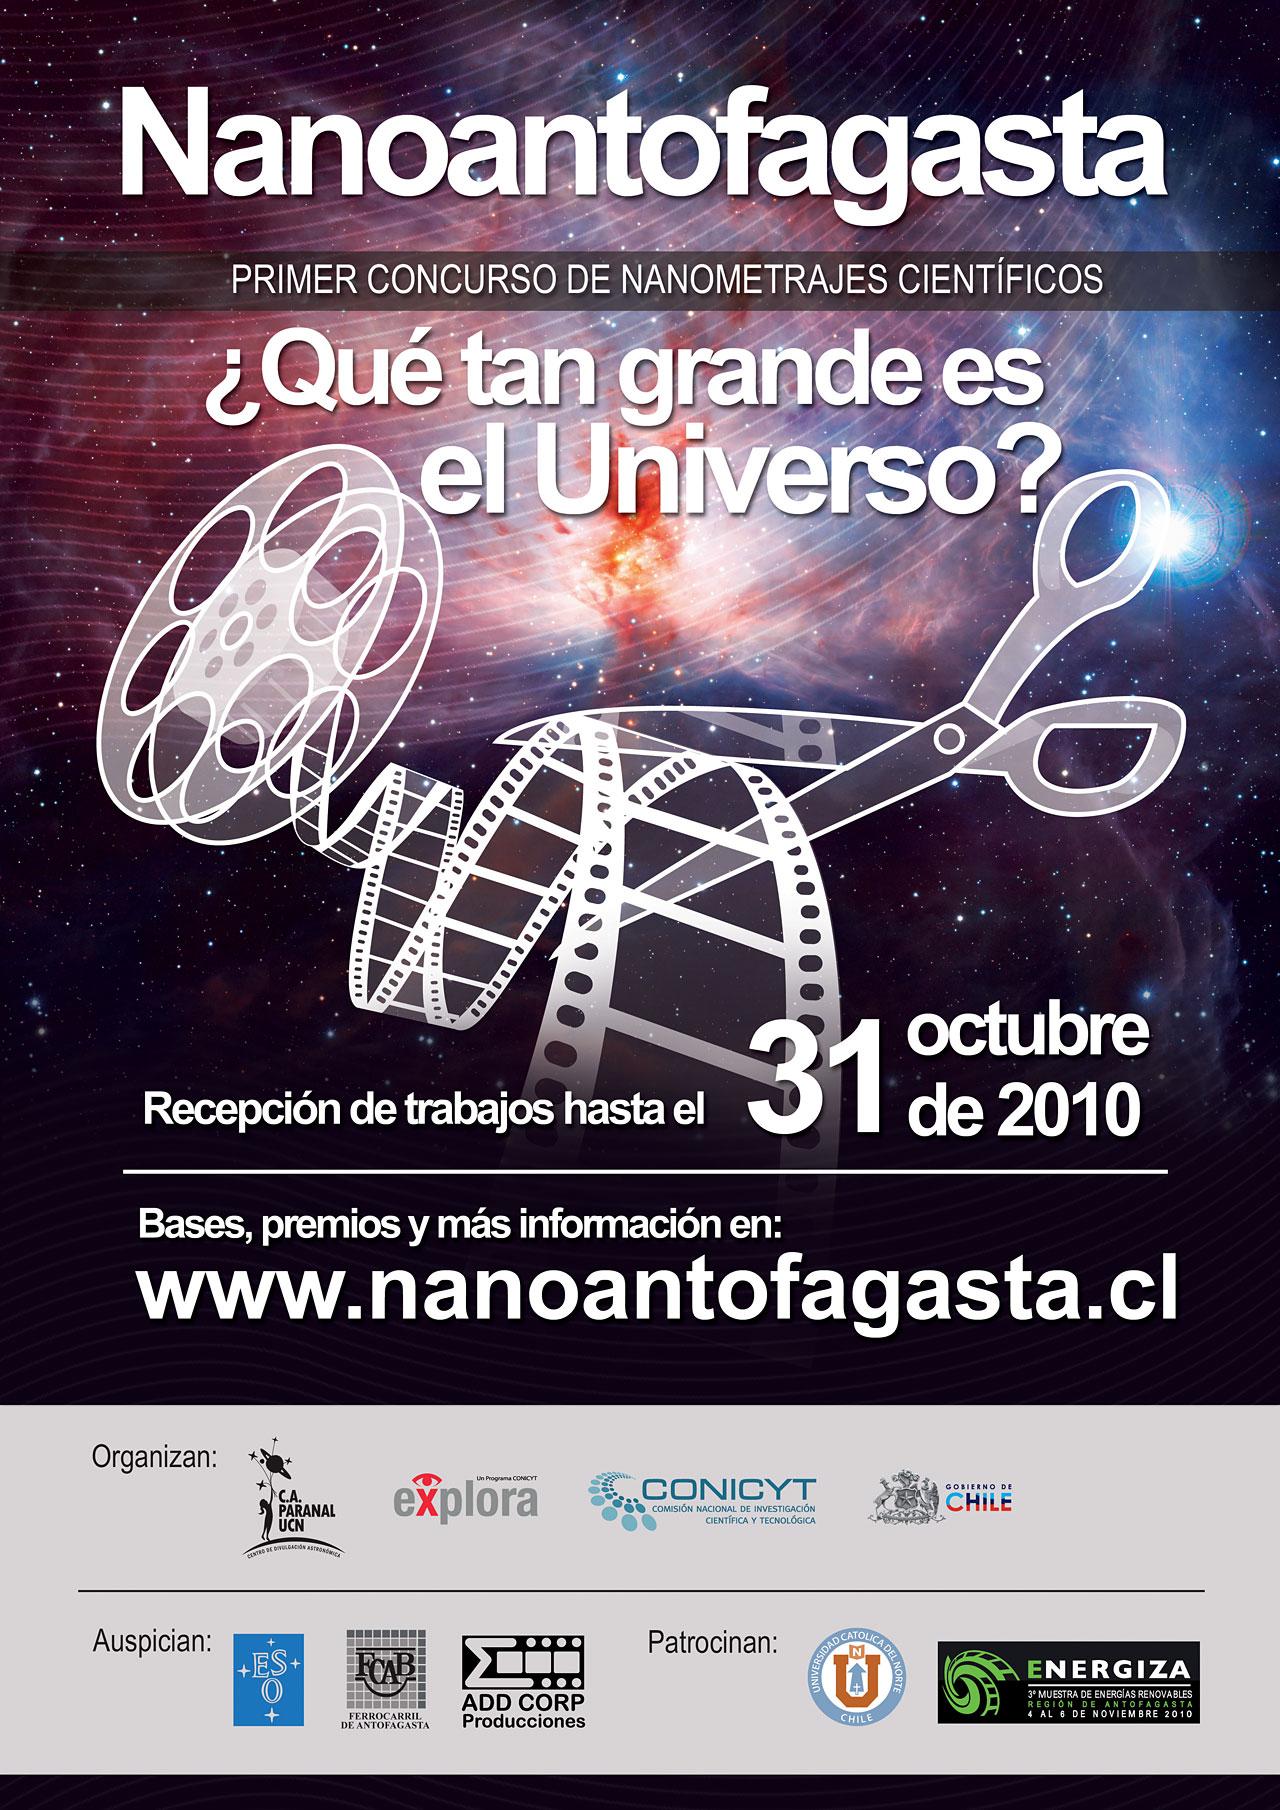 Poster for the Nanoantofagasta competition